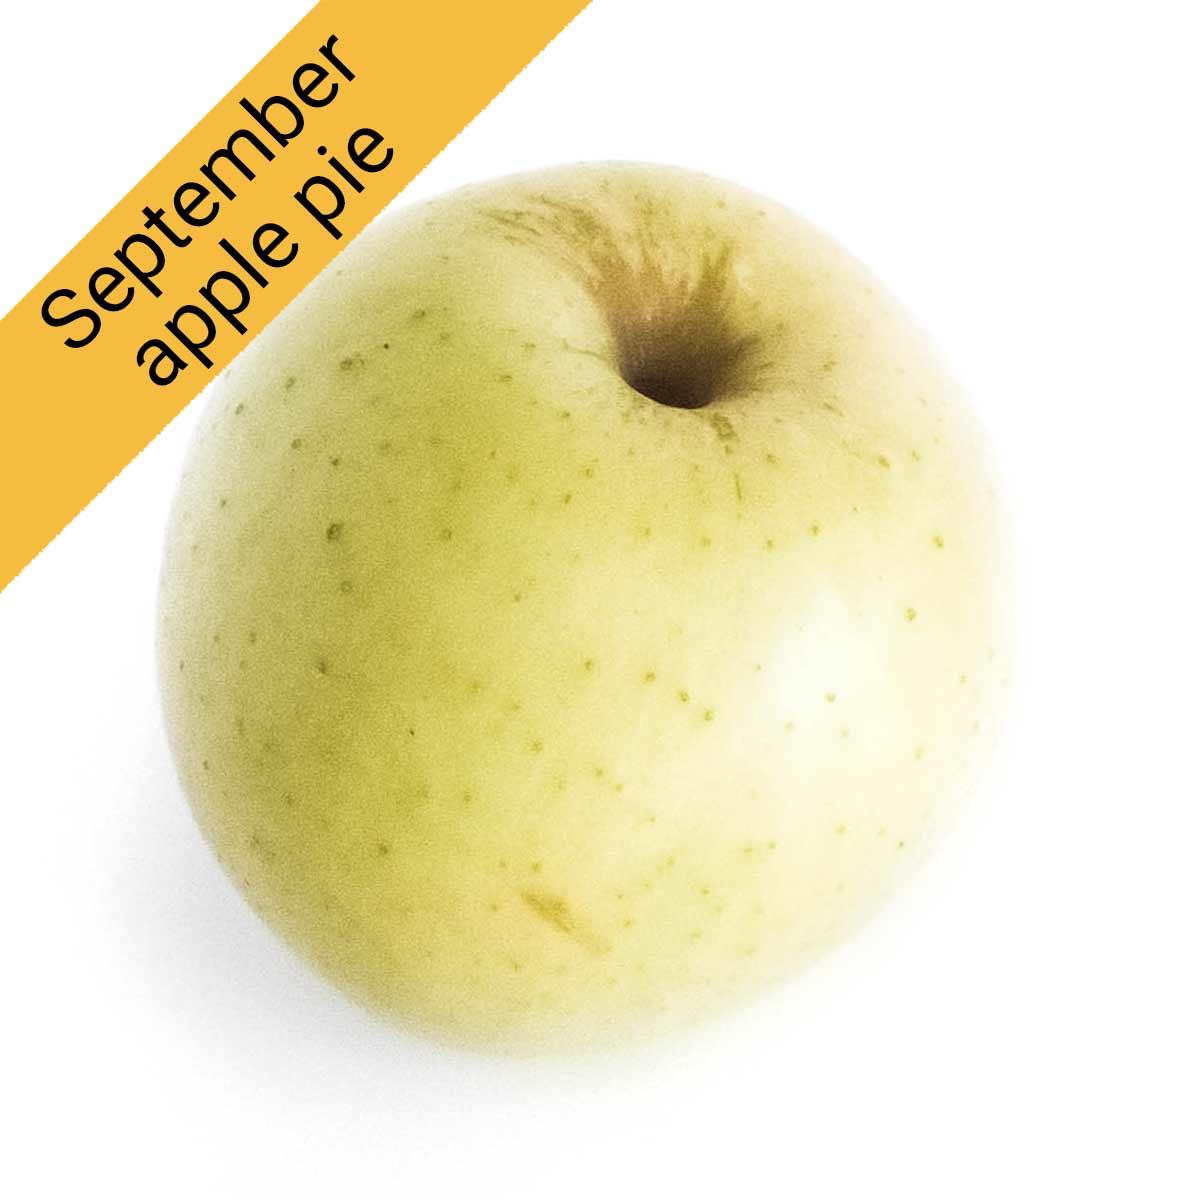 Best apples for pies in September: Golden Supreme